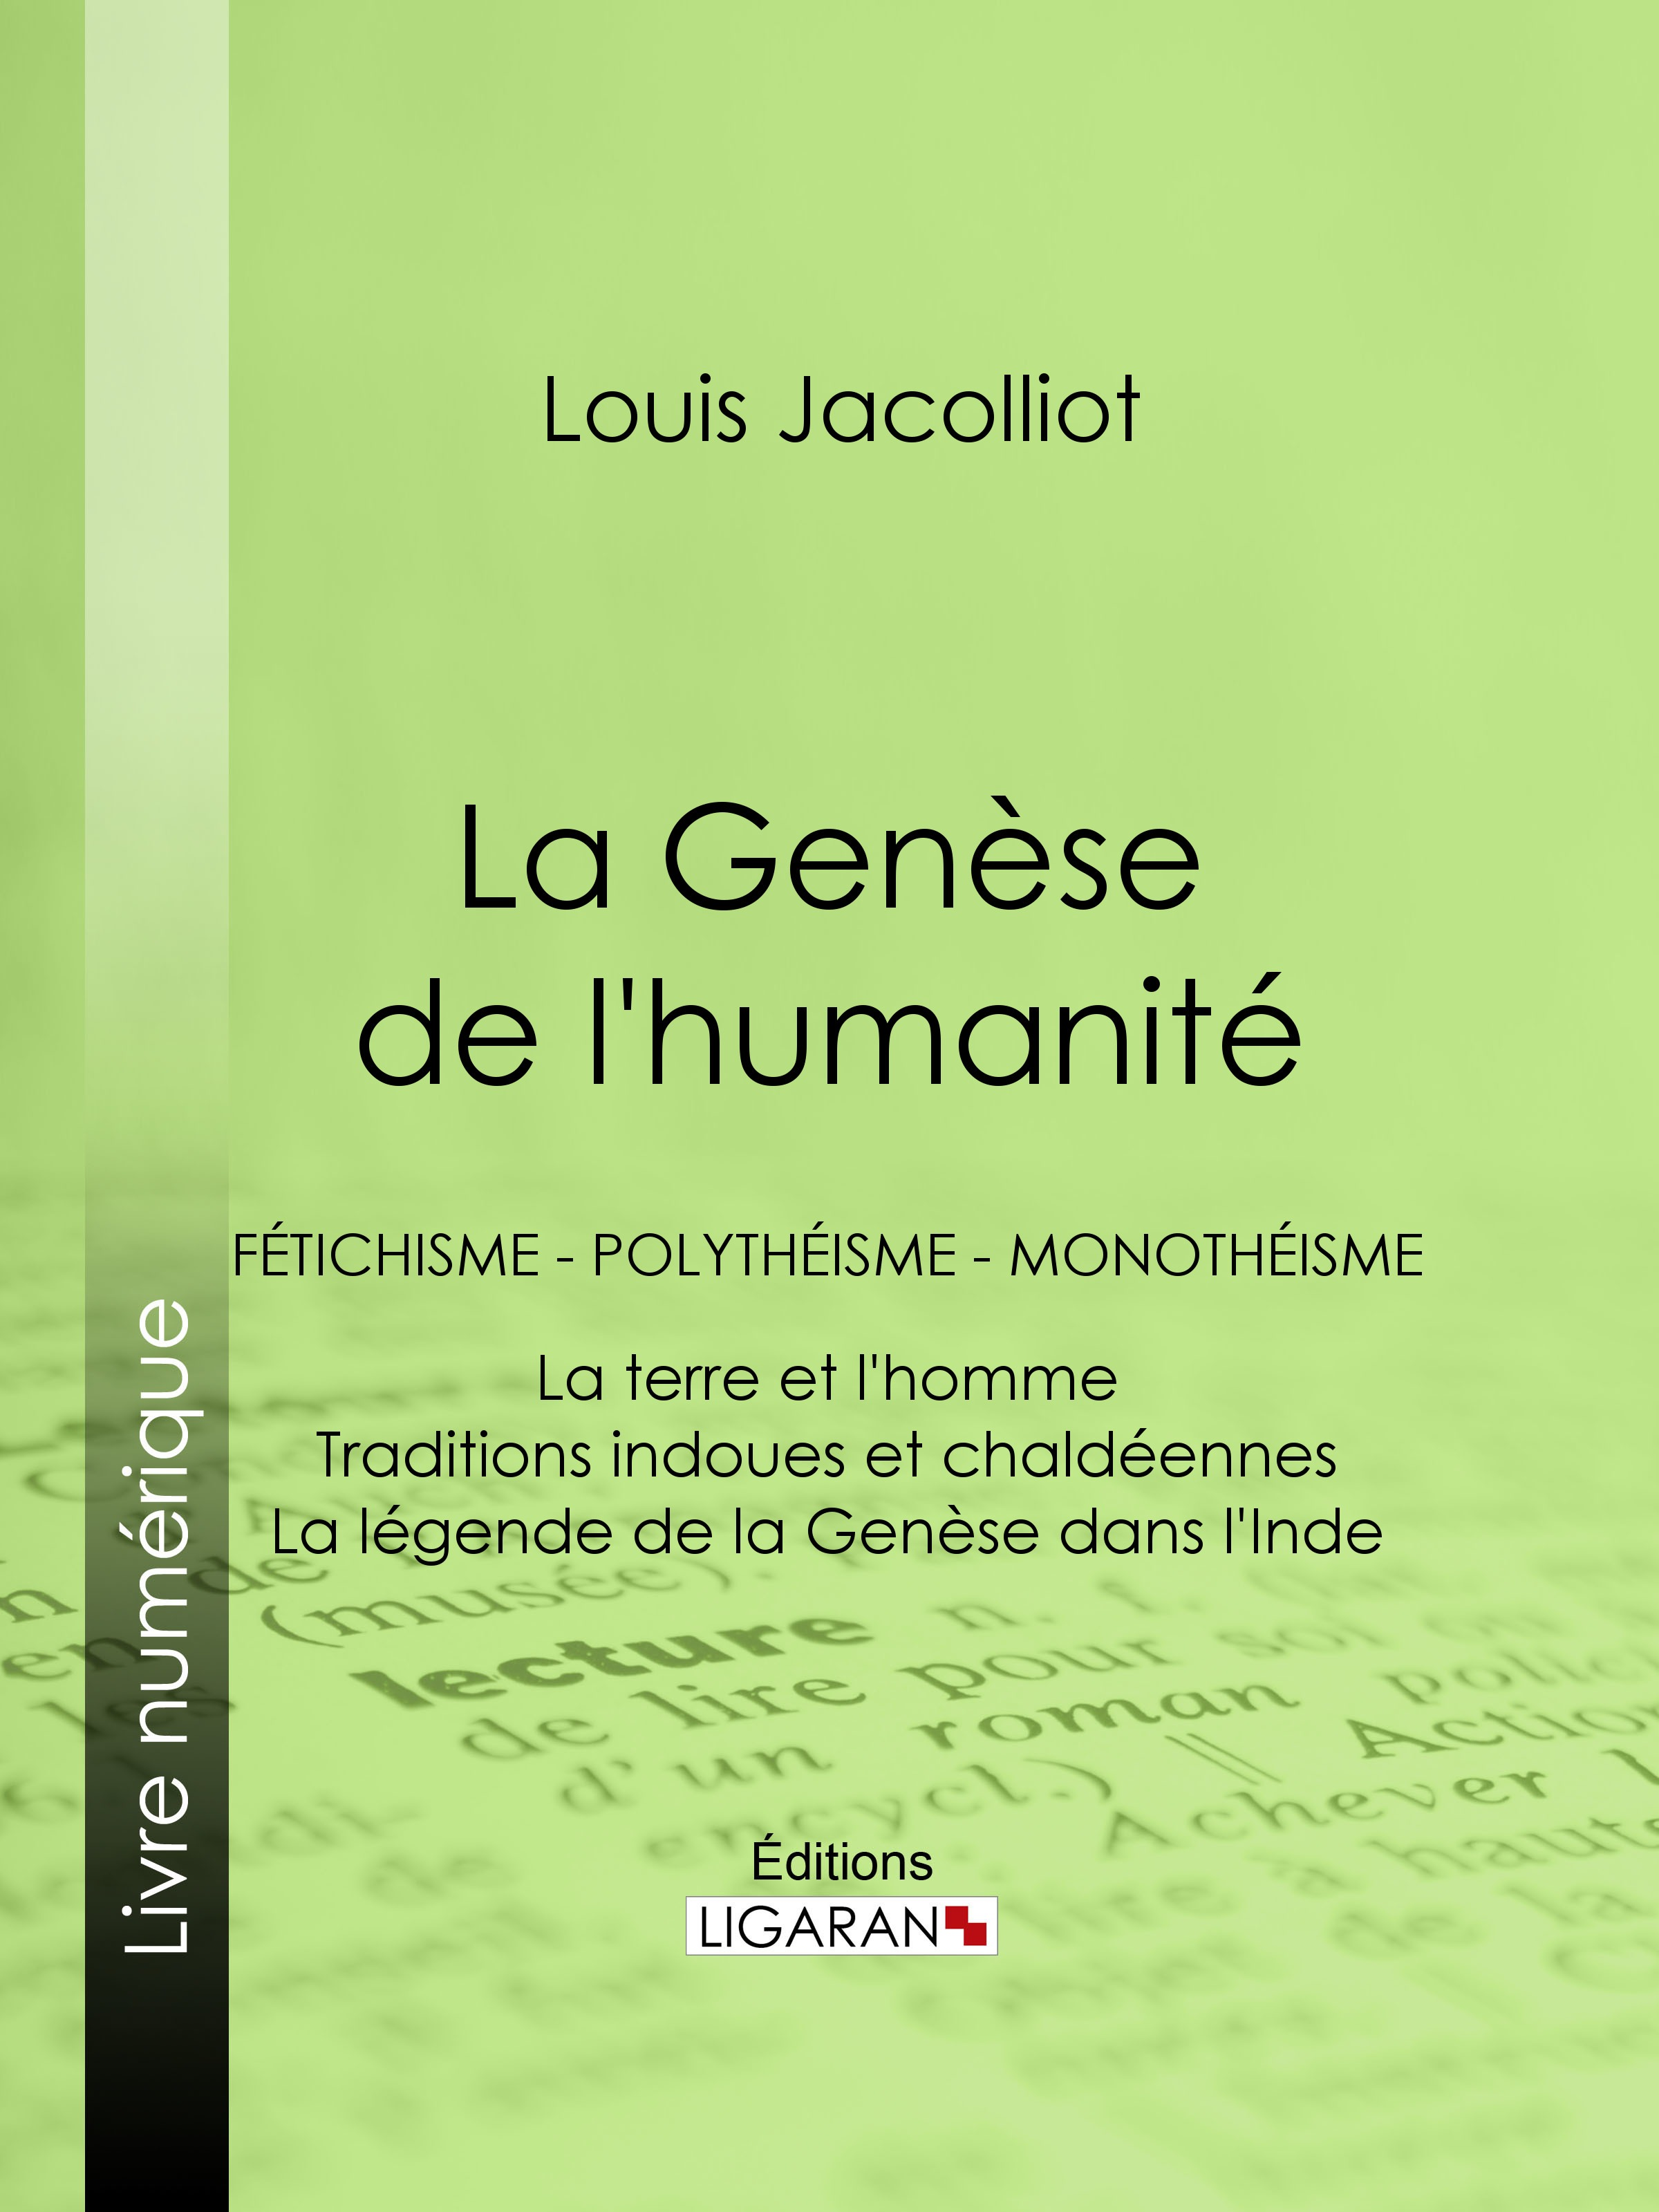 La Genèse de l'humanité